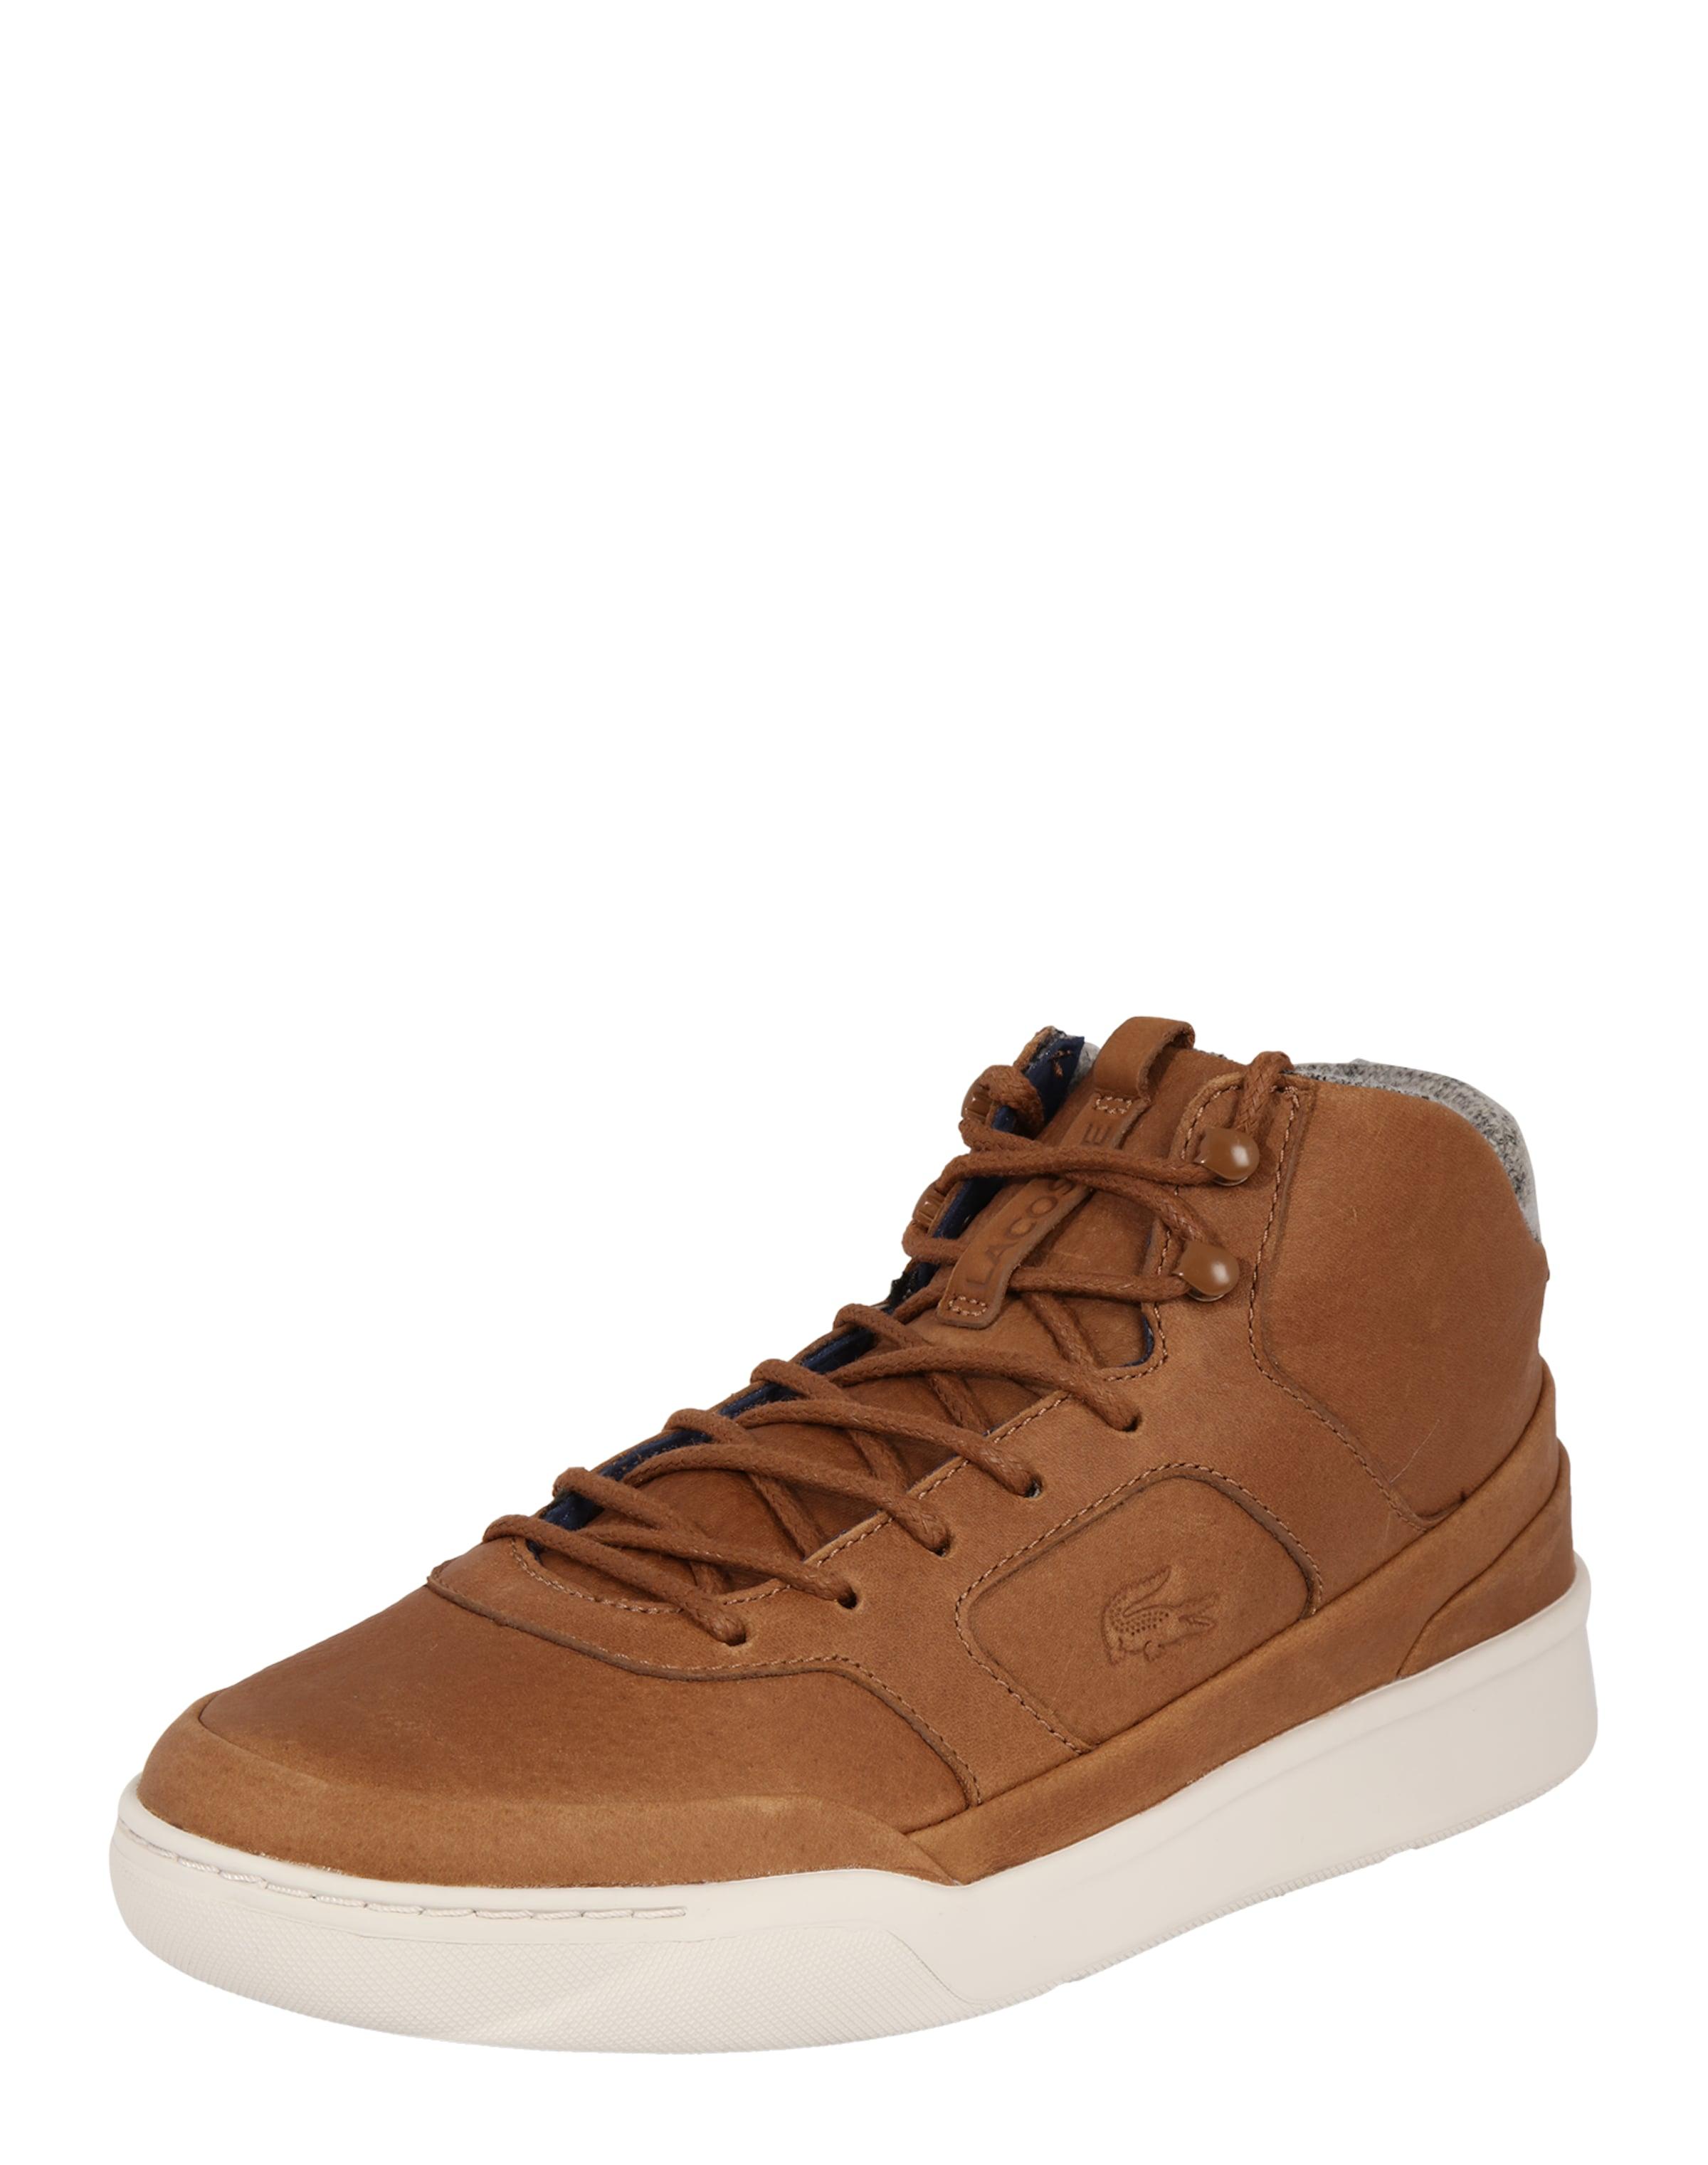 LACOSTE Sneaker Explorateur Verschleißfeste billige Schuhe